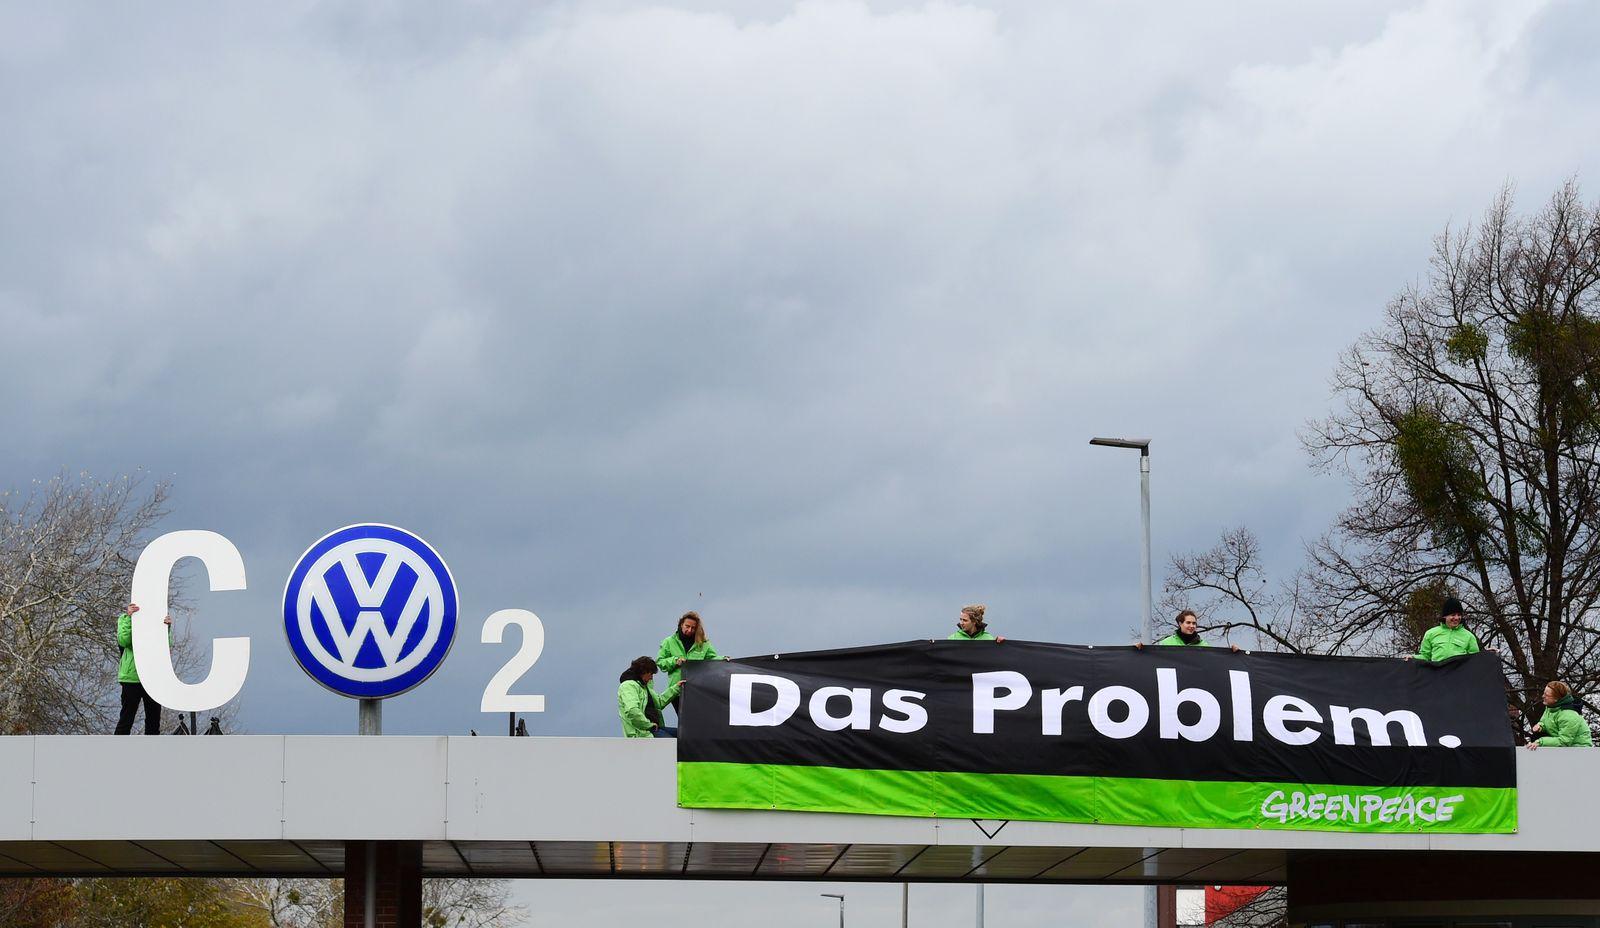 Volkswagen/ Greenpeace